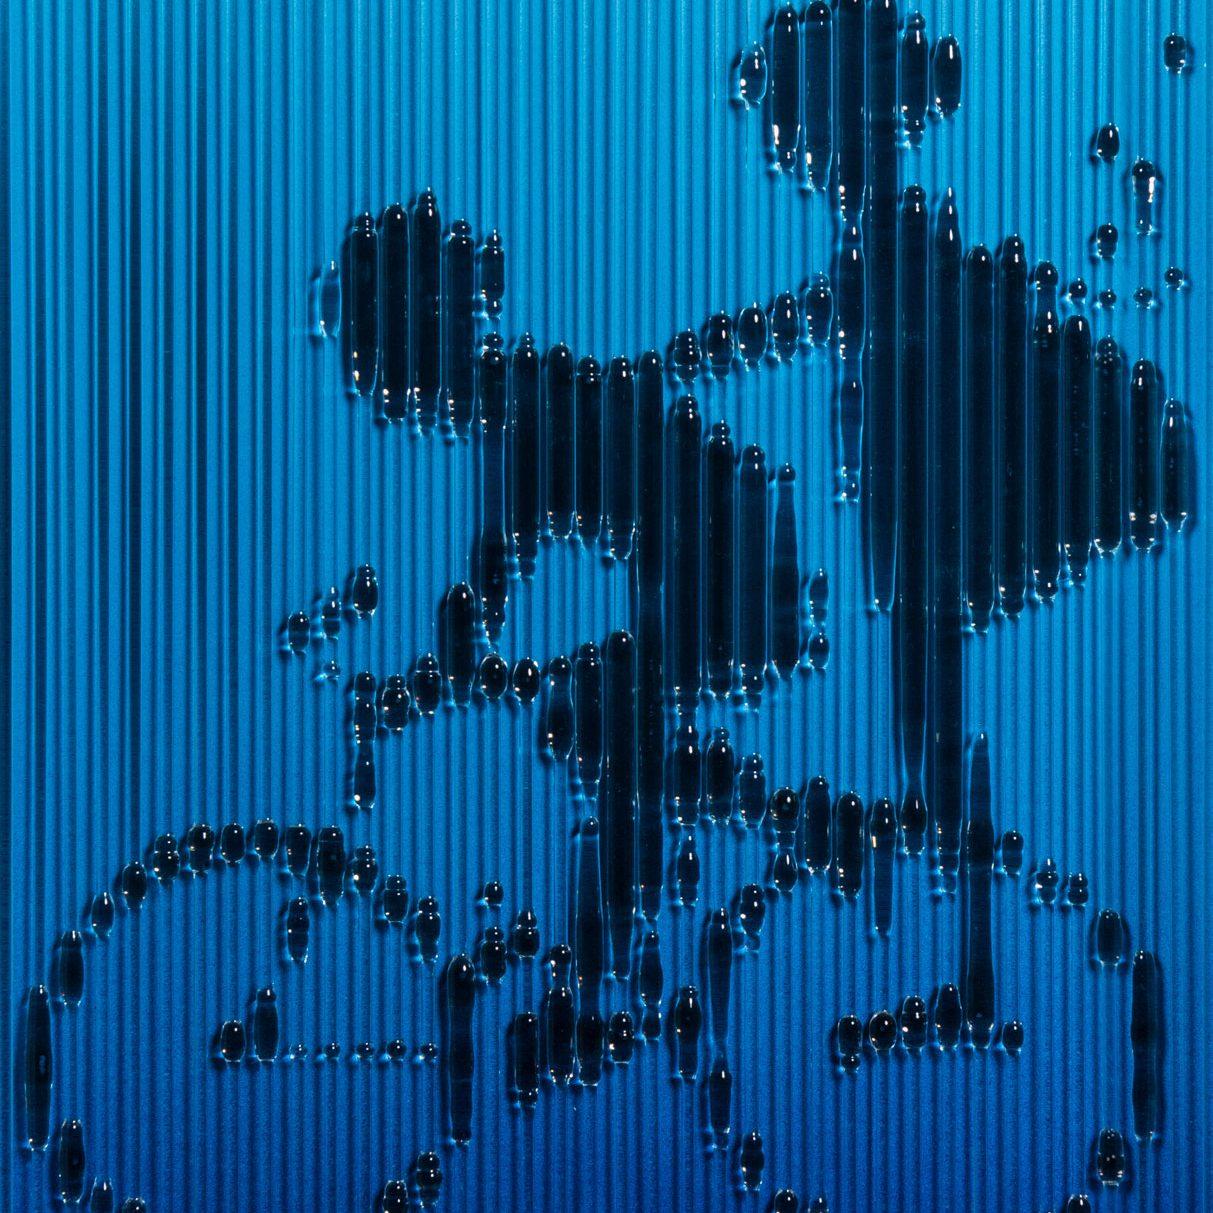 David-Alper-Bike-dark